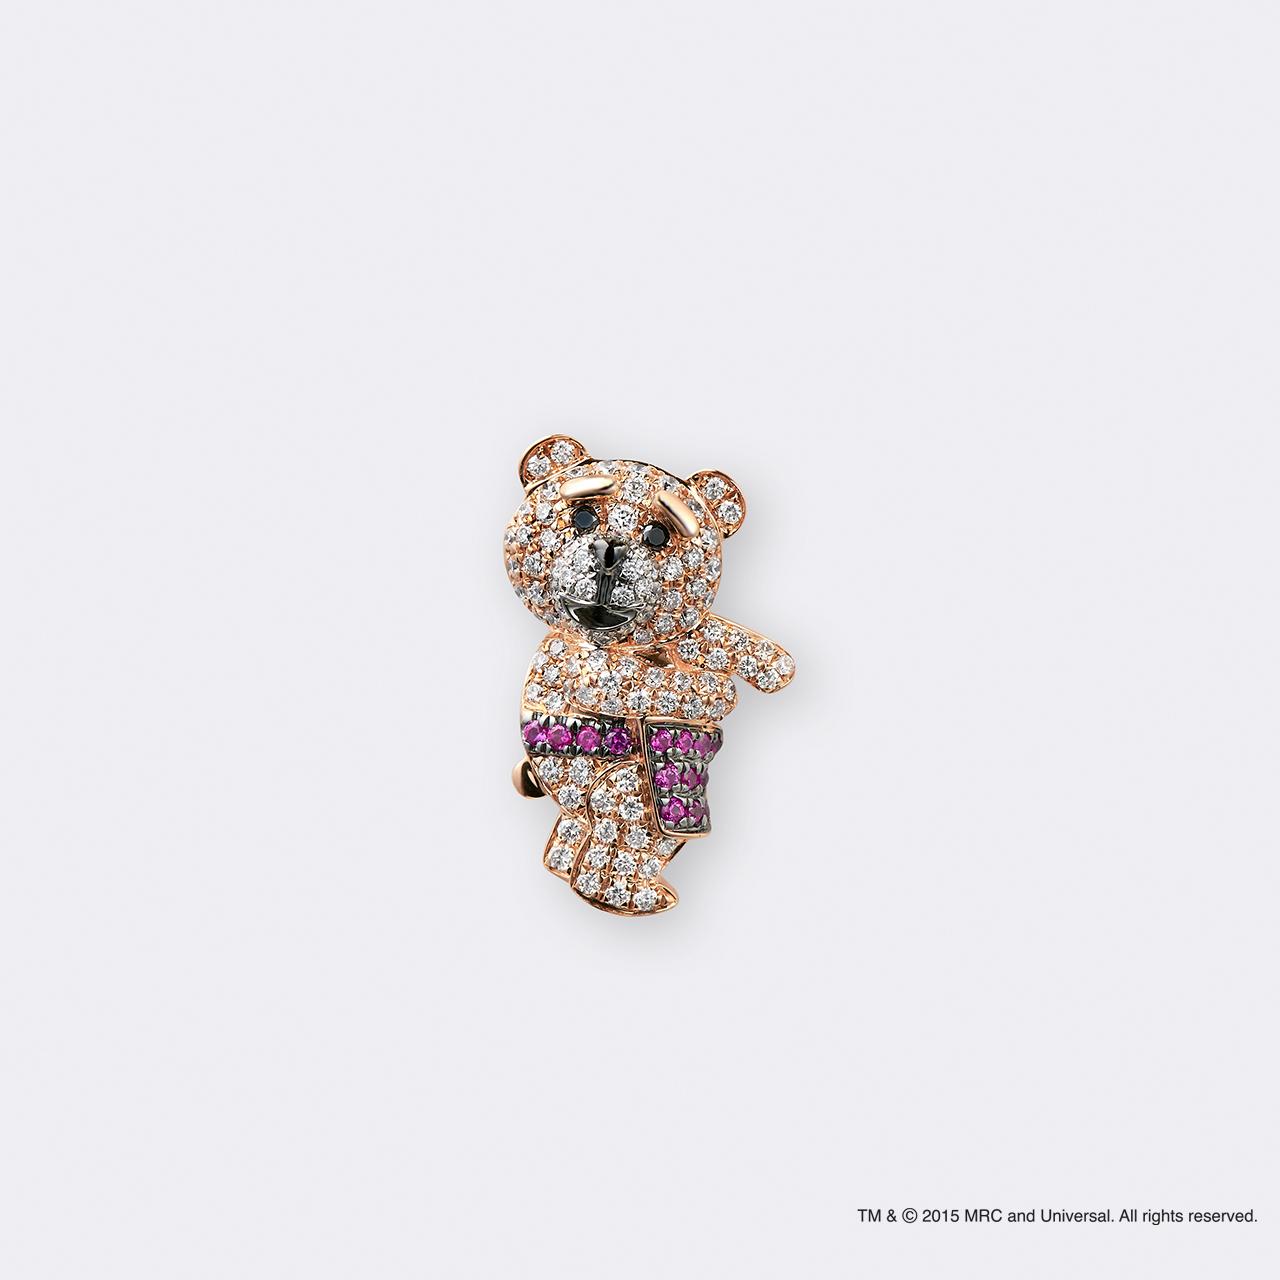 Ted2×BIJOUPIKO (テッド2×ビジュピコ コラボレーションジュエリー)K18PG ピンブローチ エプロン